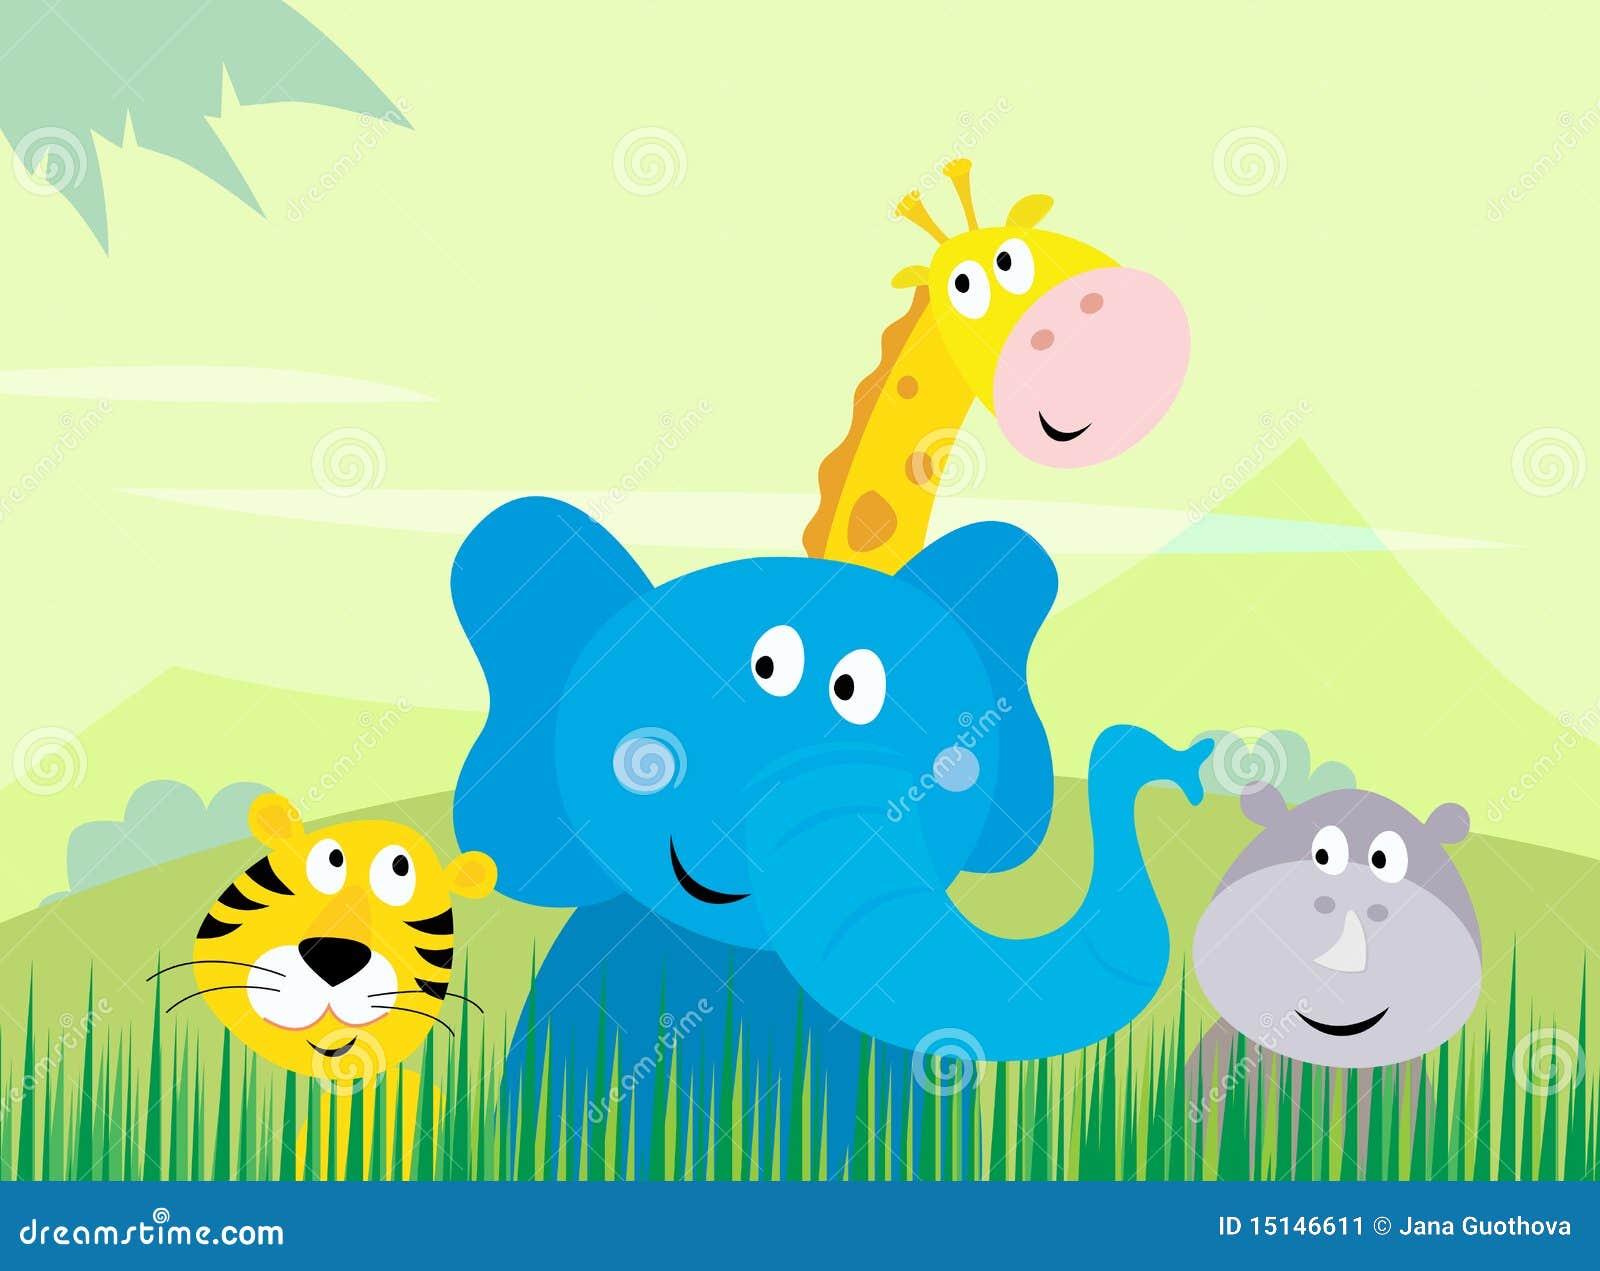 Animales lindos de la selva del safari - tigre, elefante, Gira